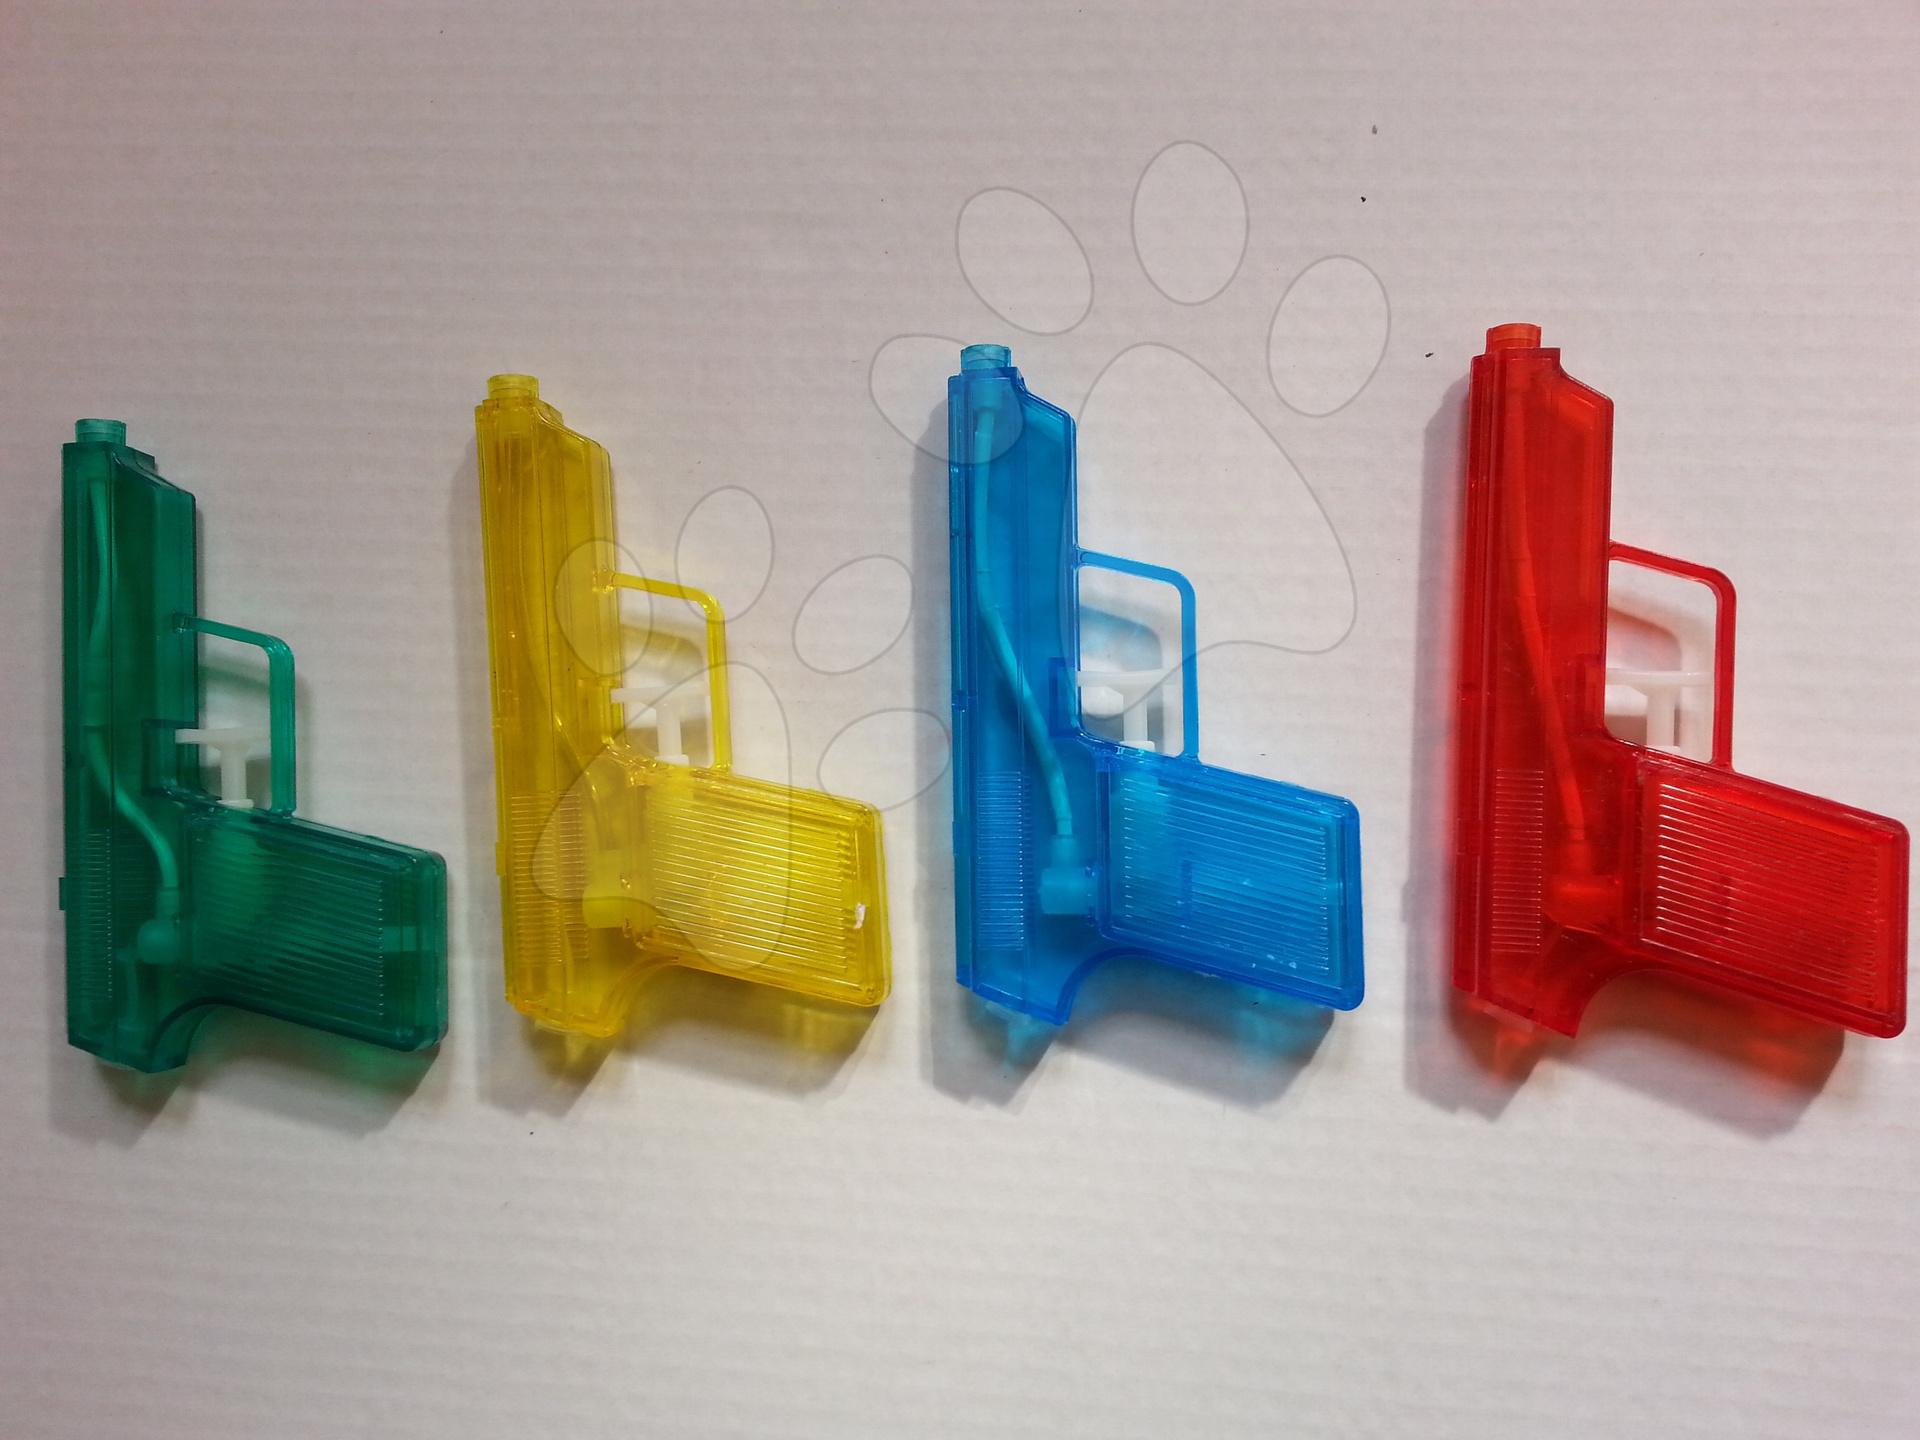 Vodná pištoľ Dohány mini 4 farby